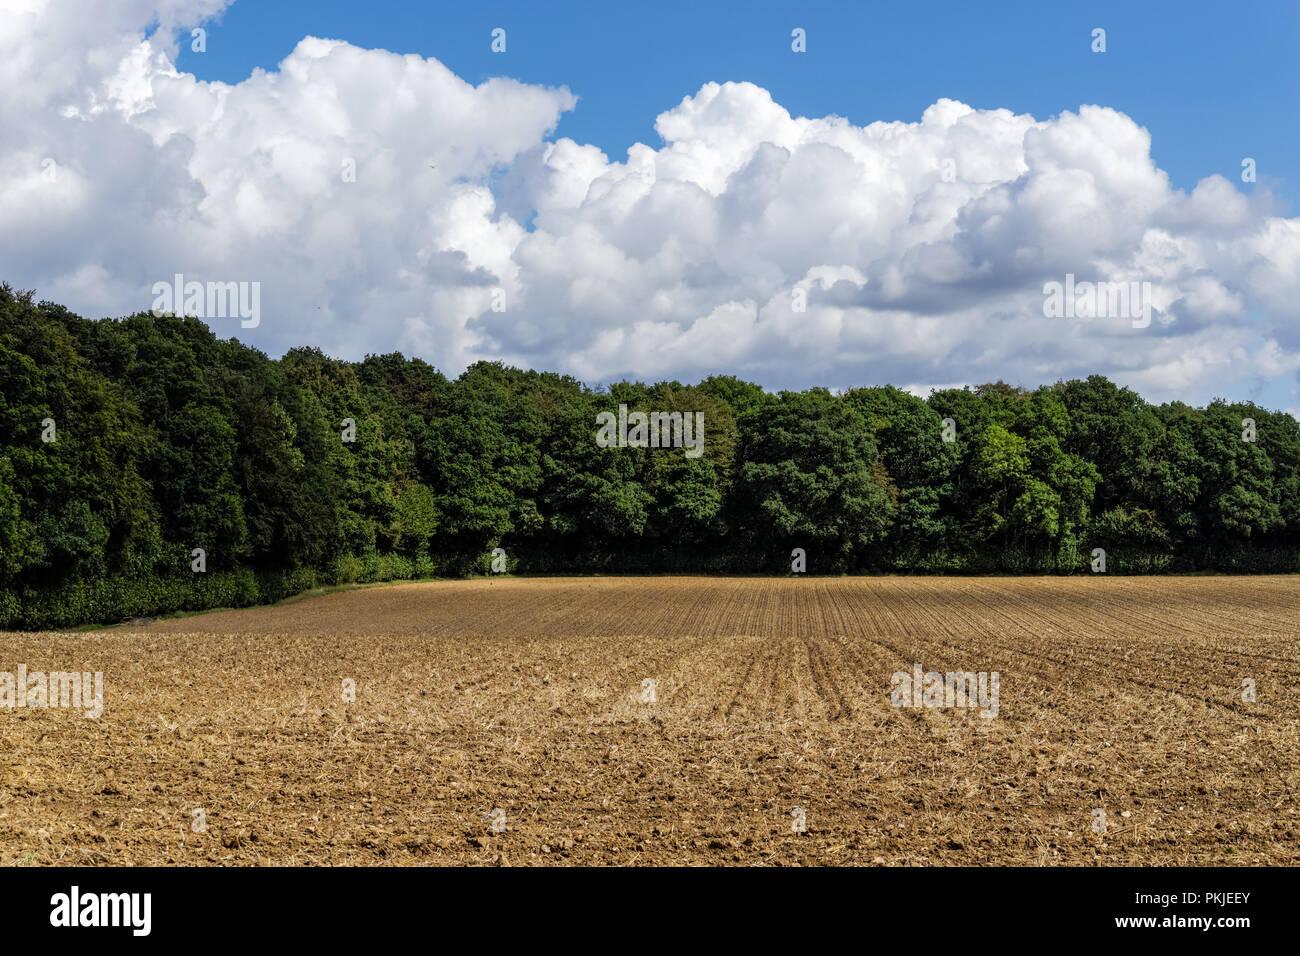 Rural landscape in the Chiltern Hills, Buckinghamshire, England United Kingdom UK - Stock Image